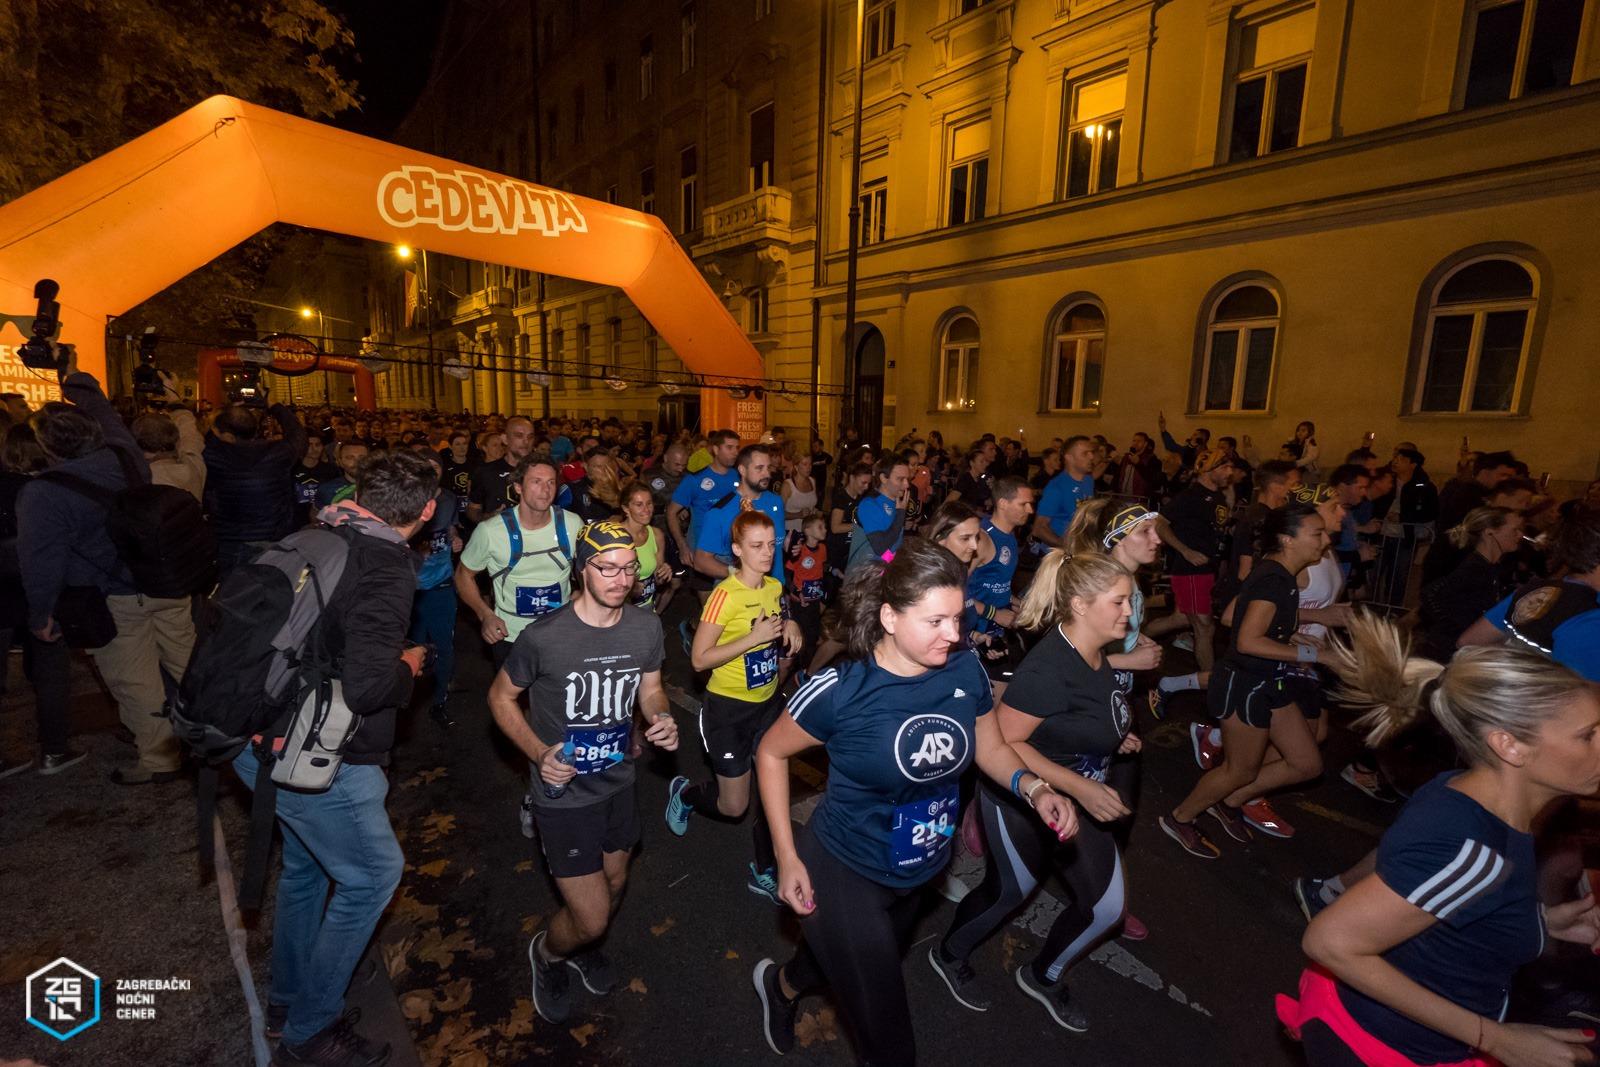 8 Zagrebacki Nocni Cener Tk Marathon 95